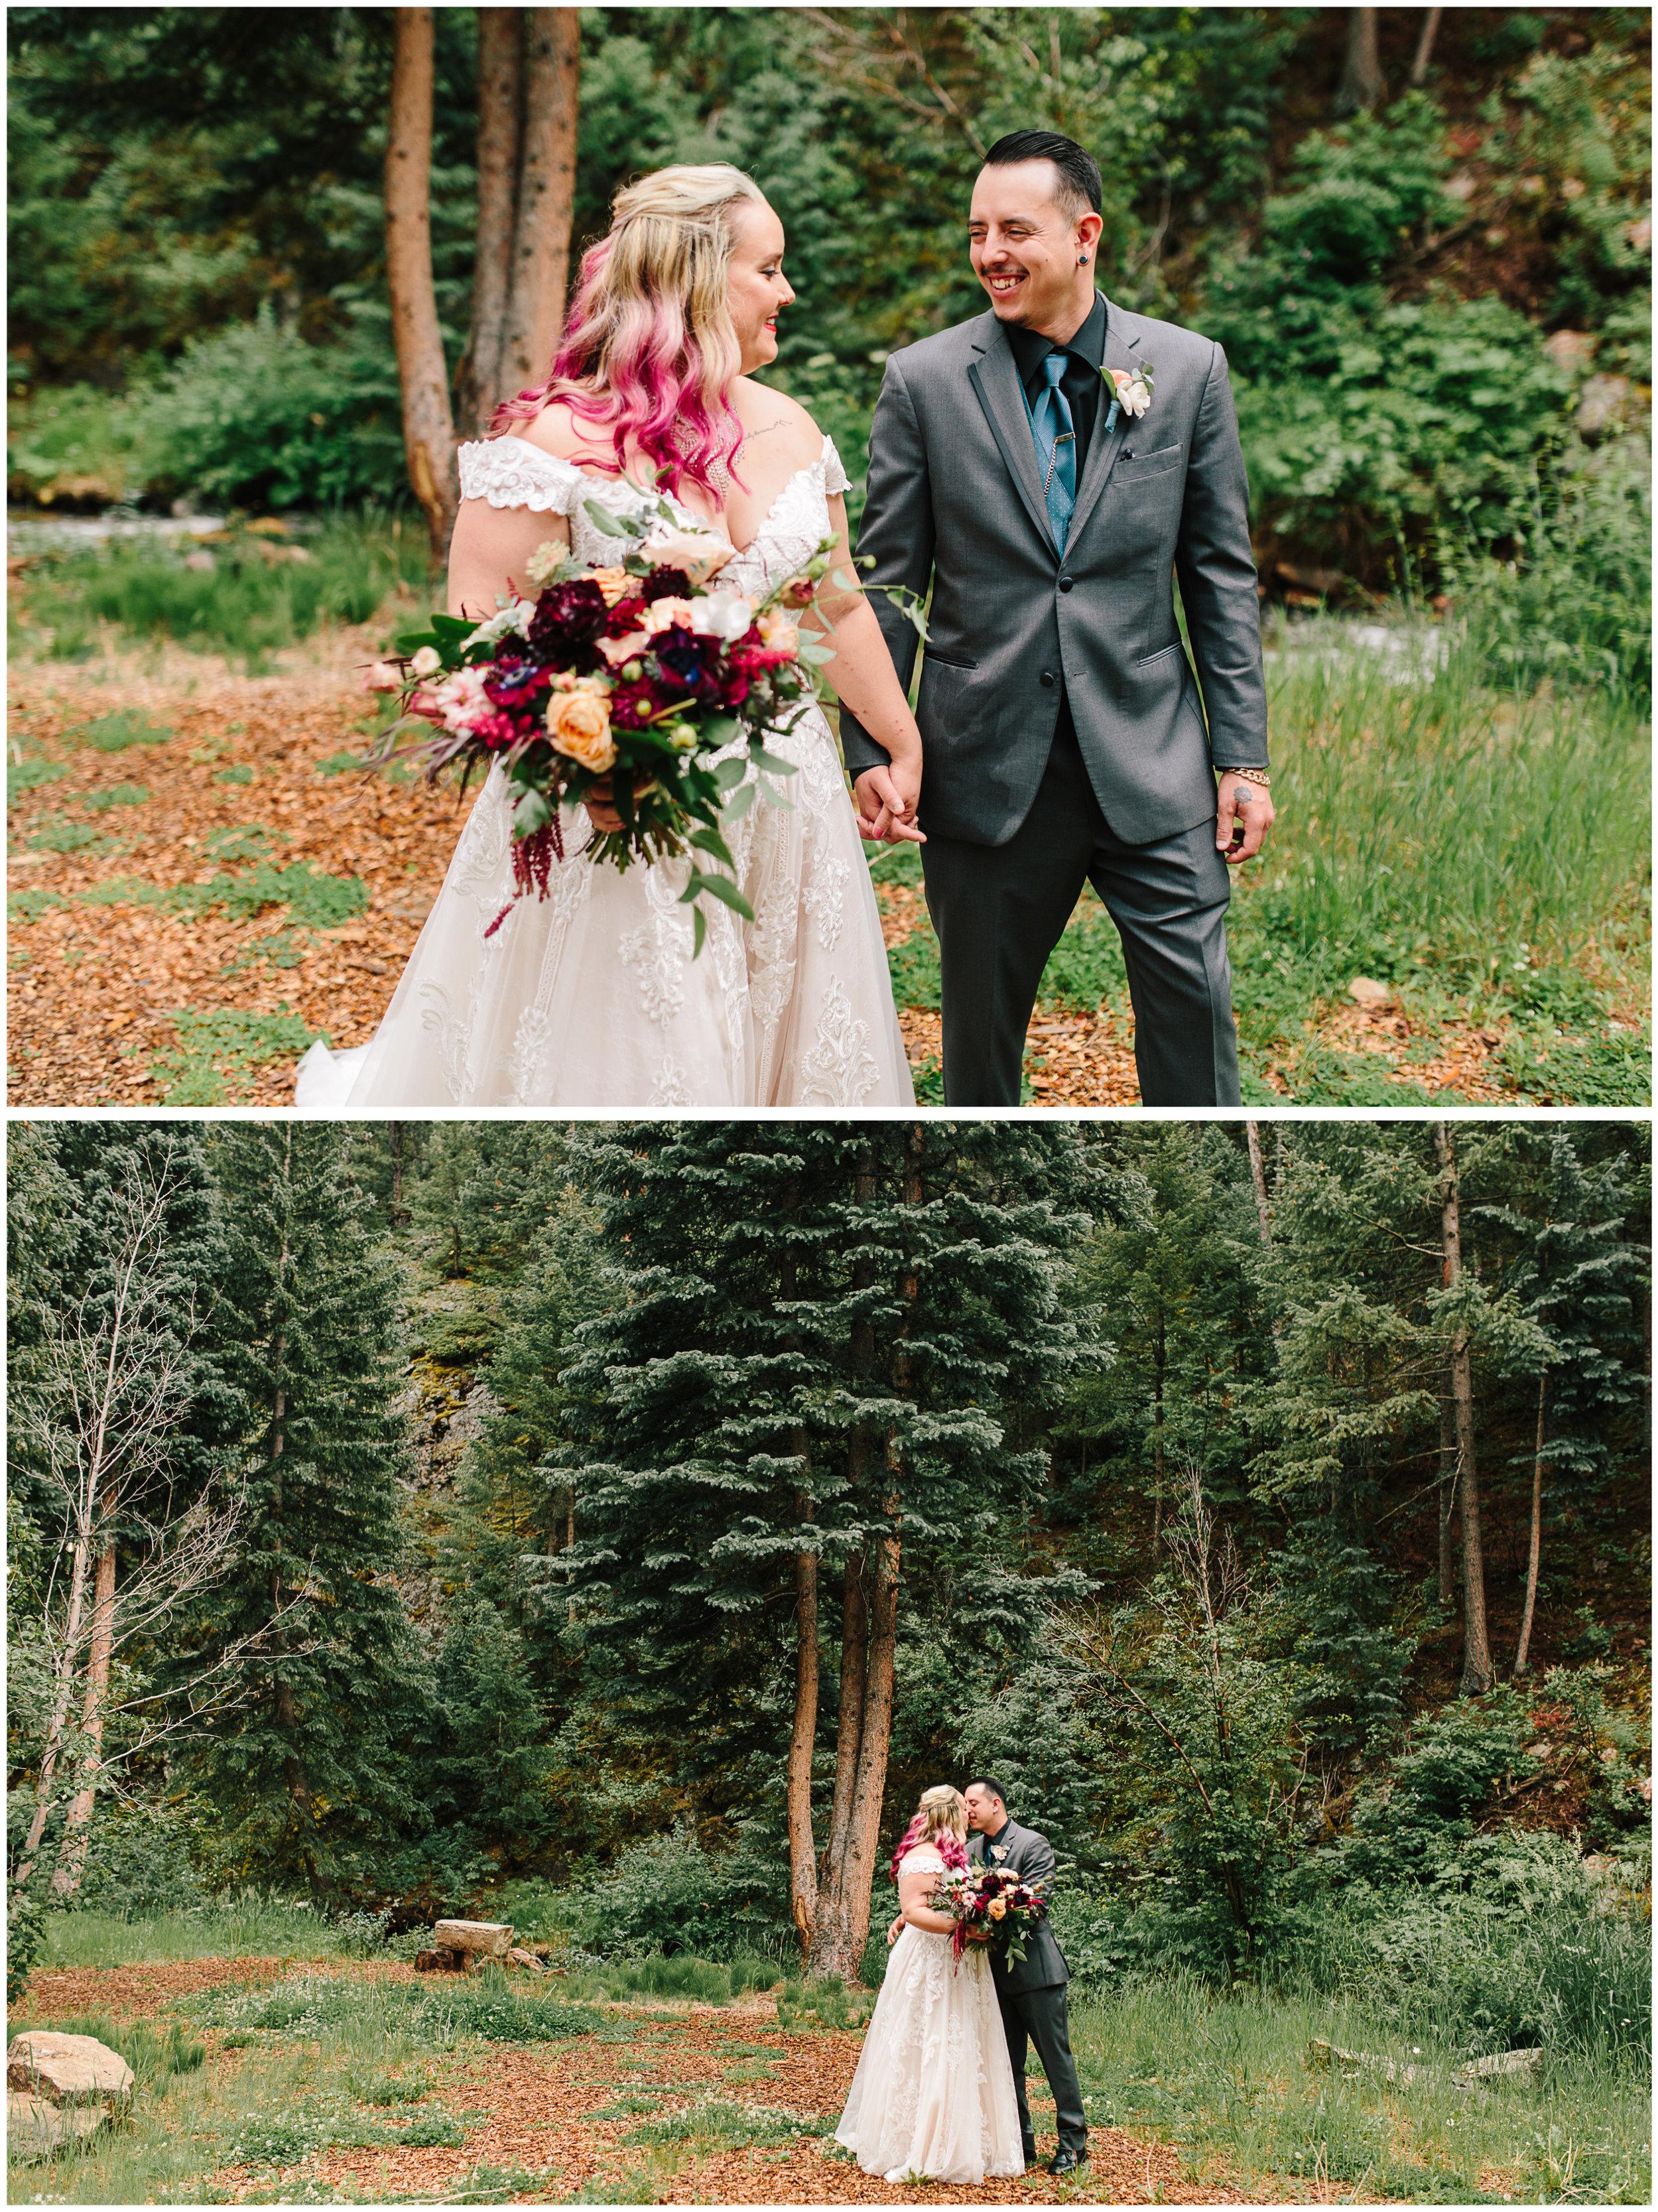 blackstone_rivers_ranch_wedding_39.jpg